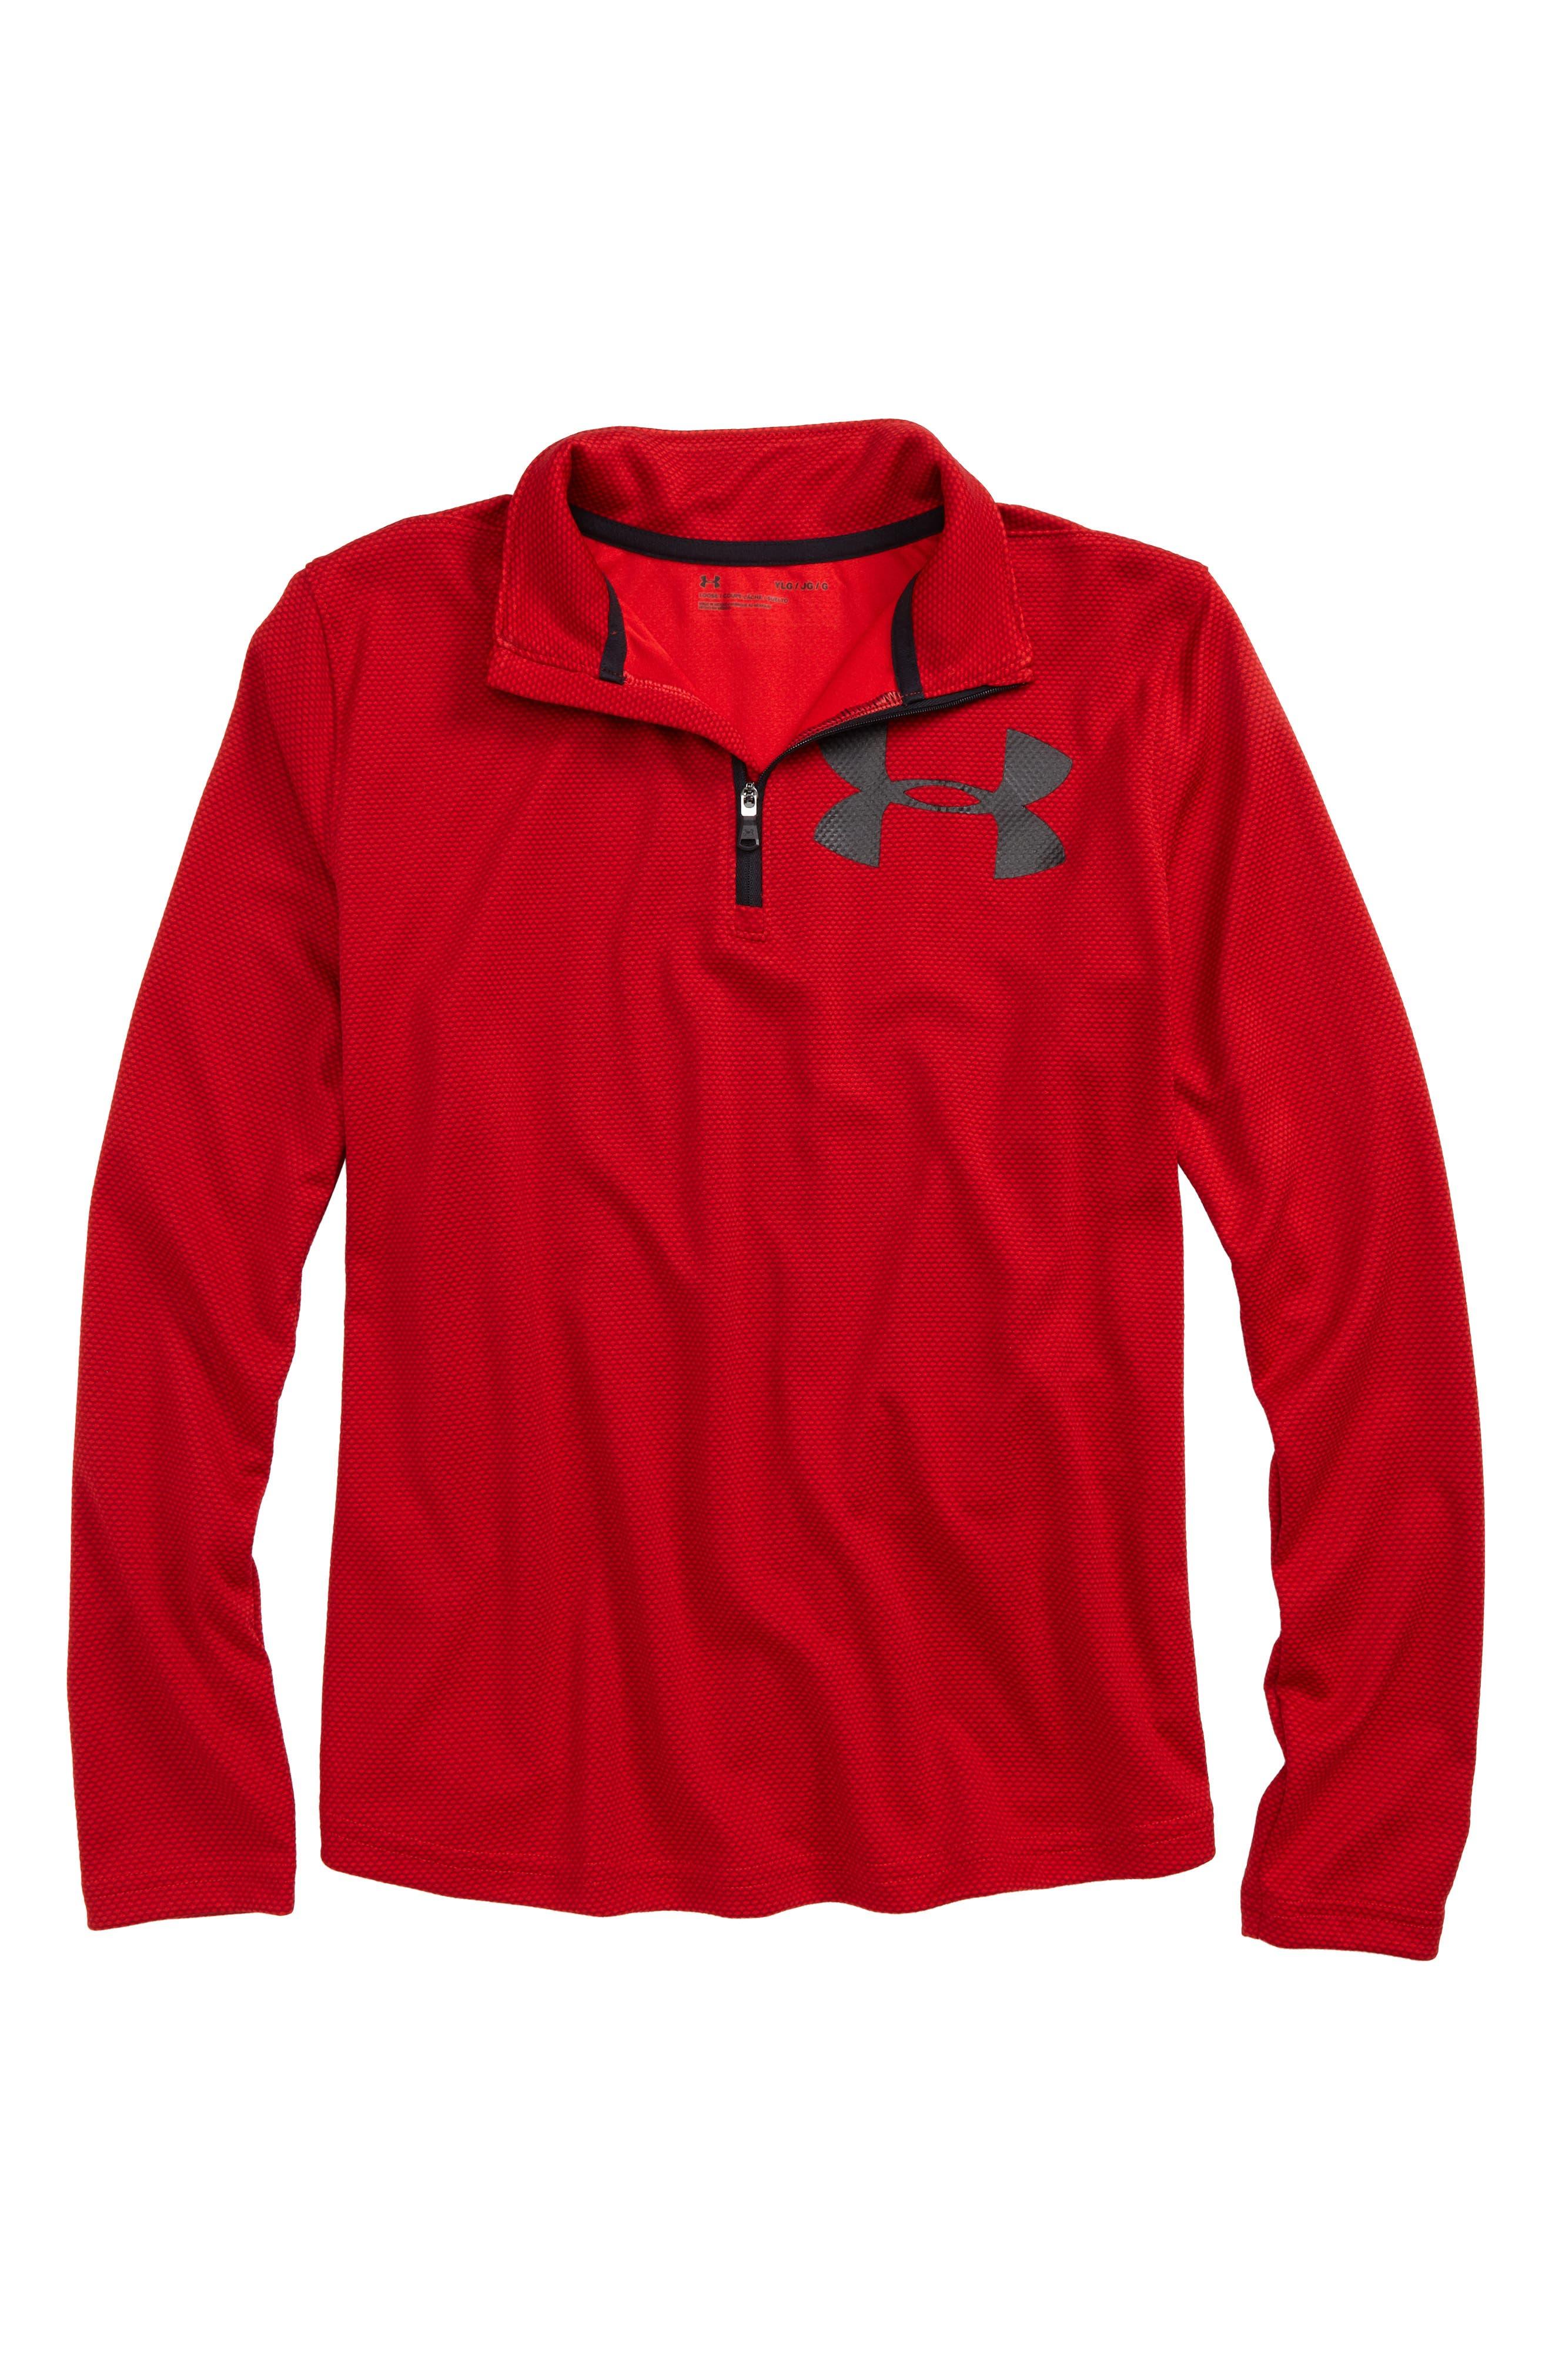 Textured Quarter Zip Top,                         Main,                         color, Red/ Black